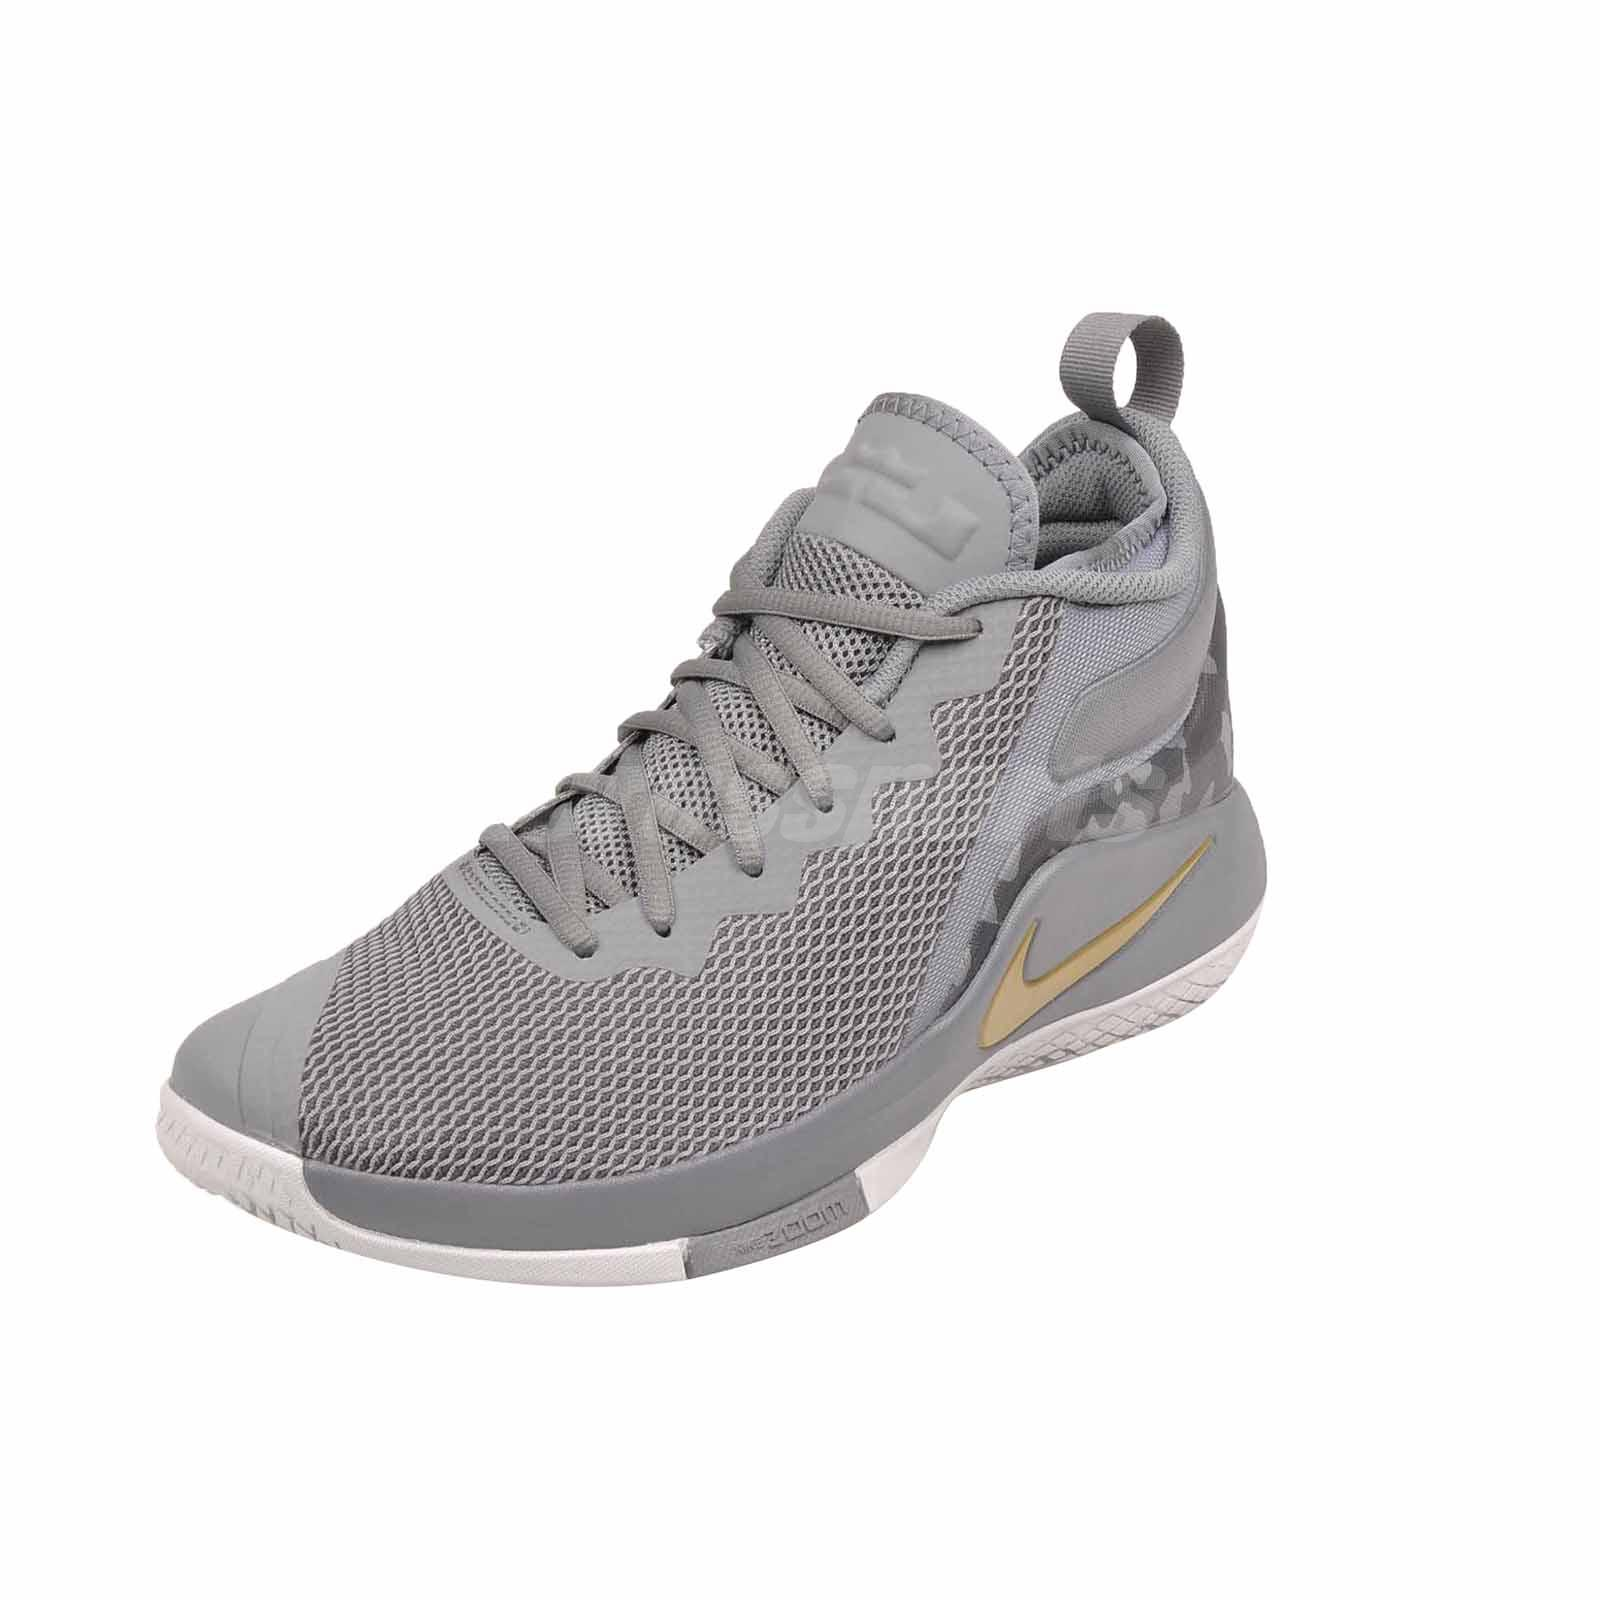 6514bfa00c3 Nike Lebron Witness II Basketball Mens Shoes Cool Grey 942518-009